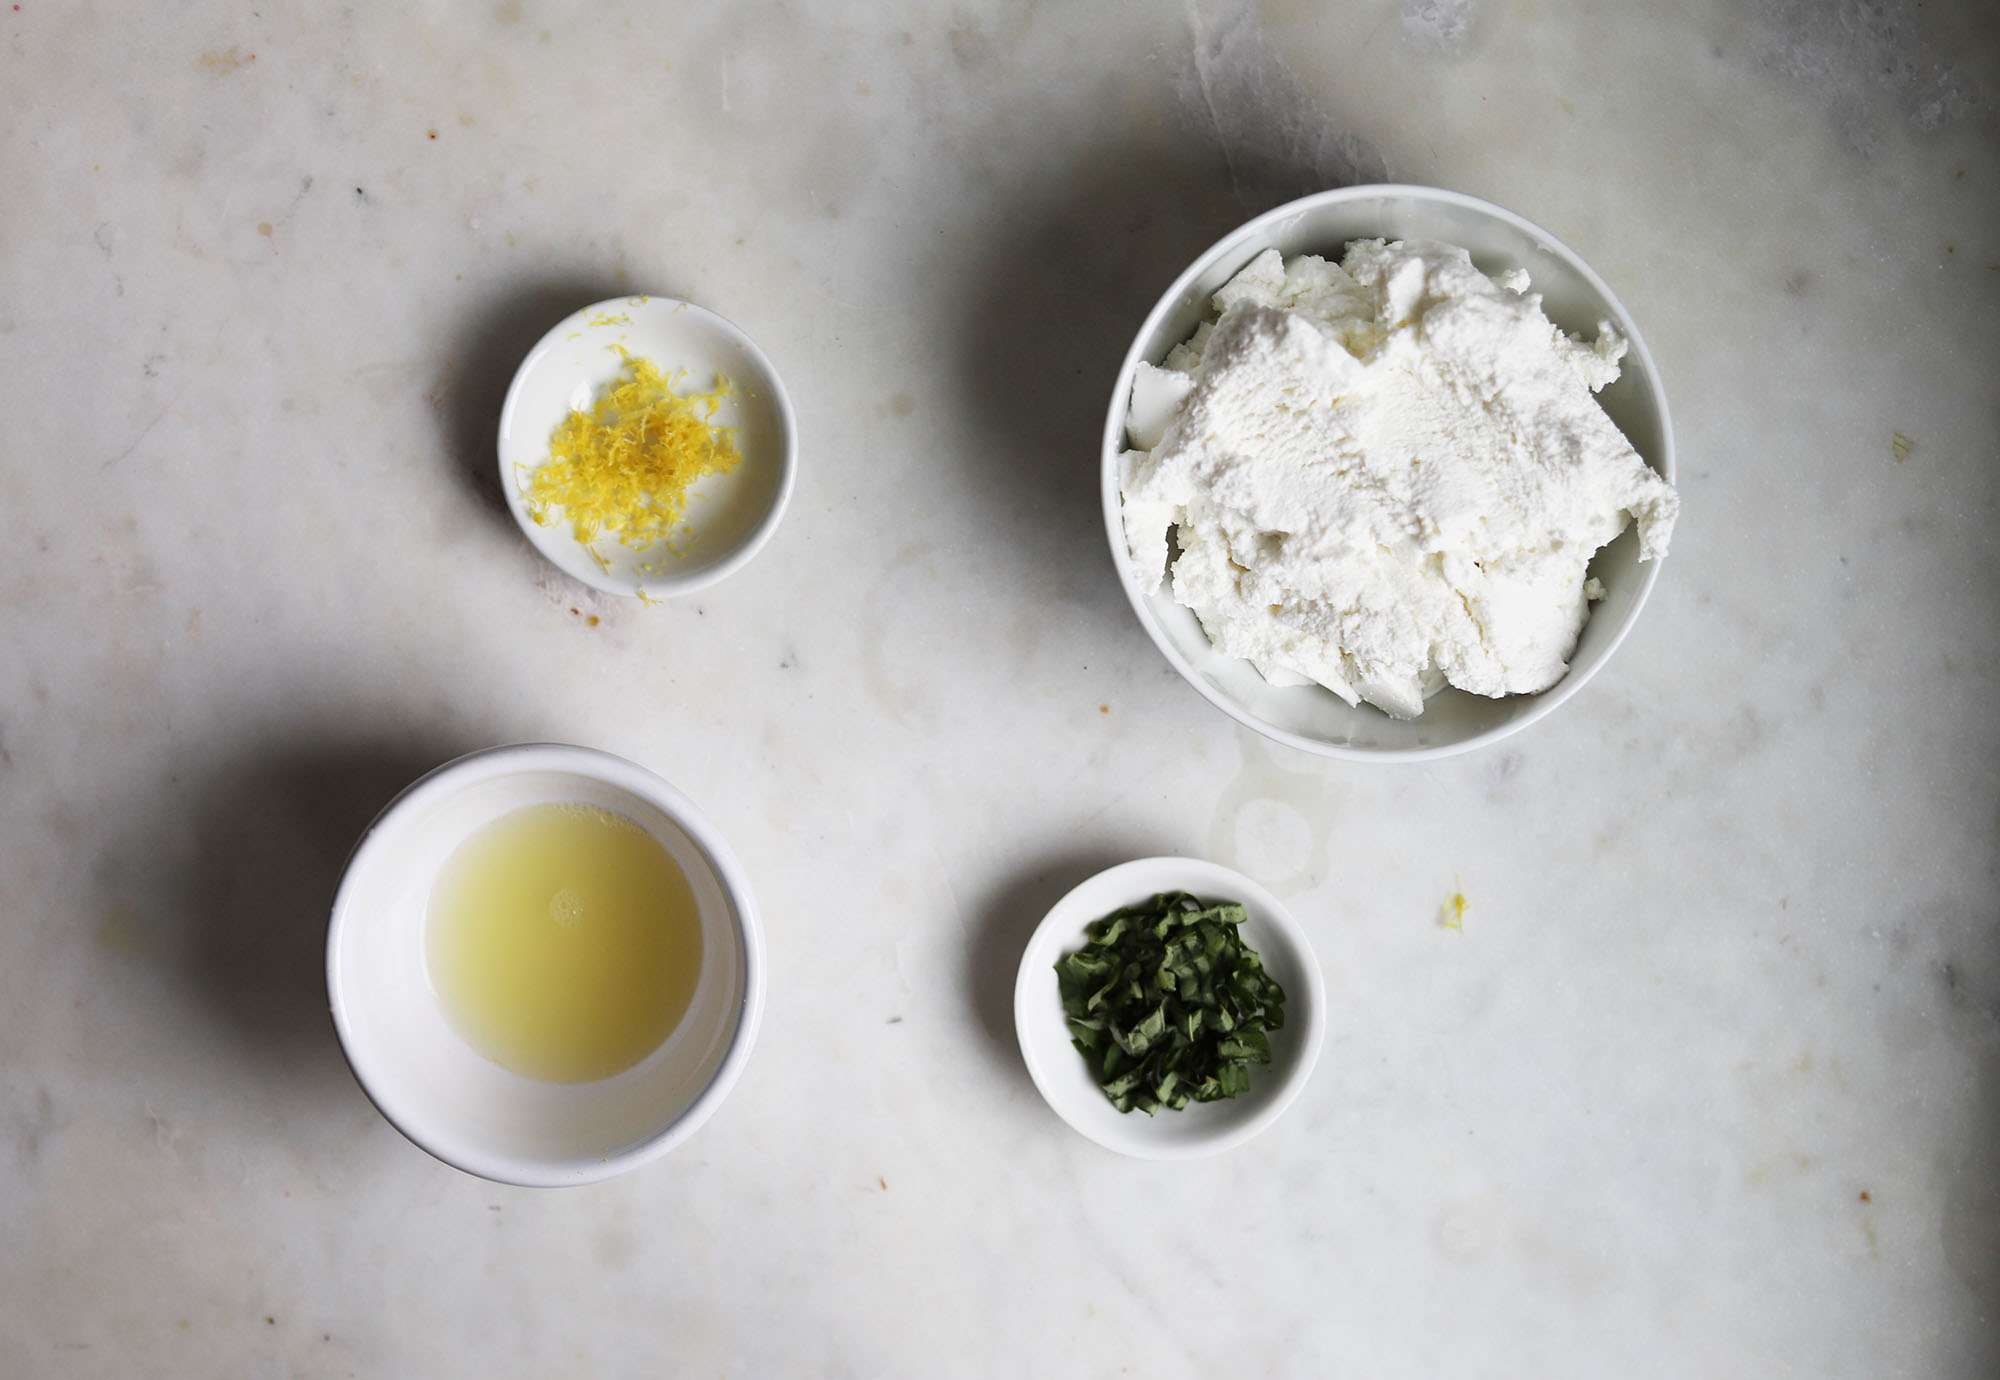 herbed ricotta ingredients